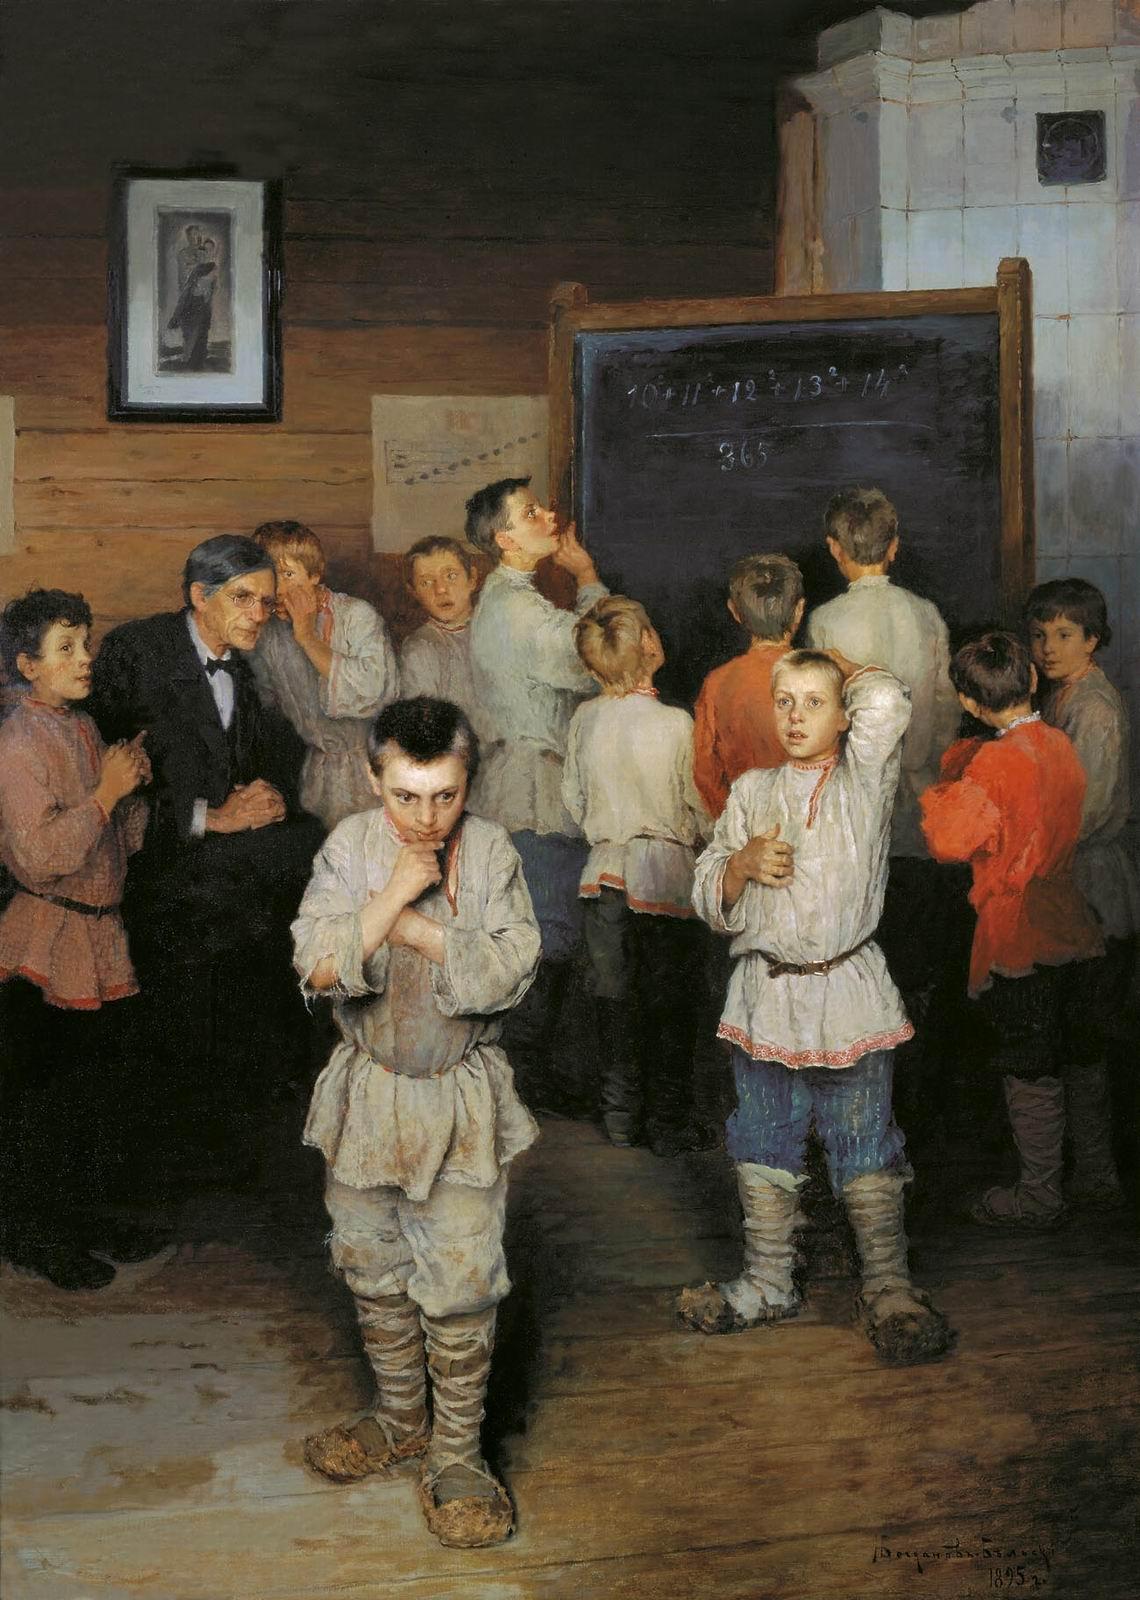 05-bogdanov-belskij-nikolaj-petrovich-1868-1945-.-ustnyj-schet-v-narodnoj-shkole-s.a.rachinskogo.-1895